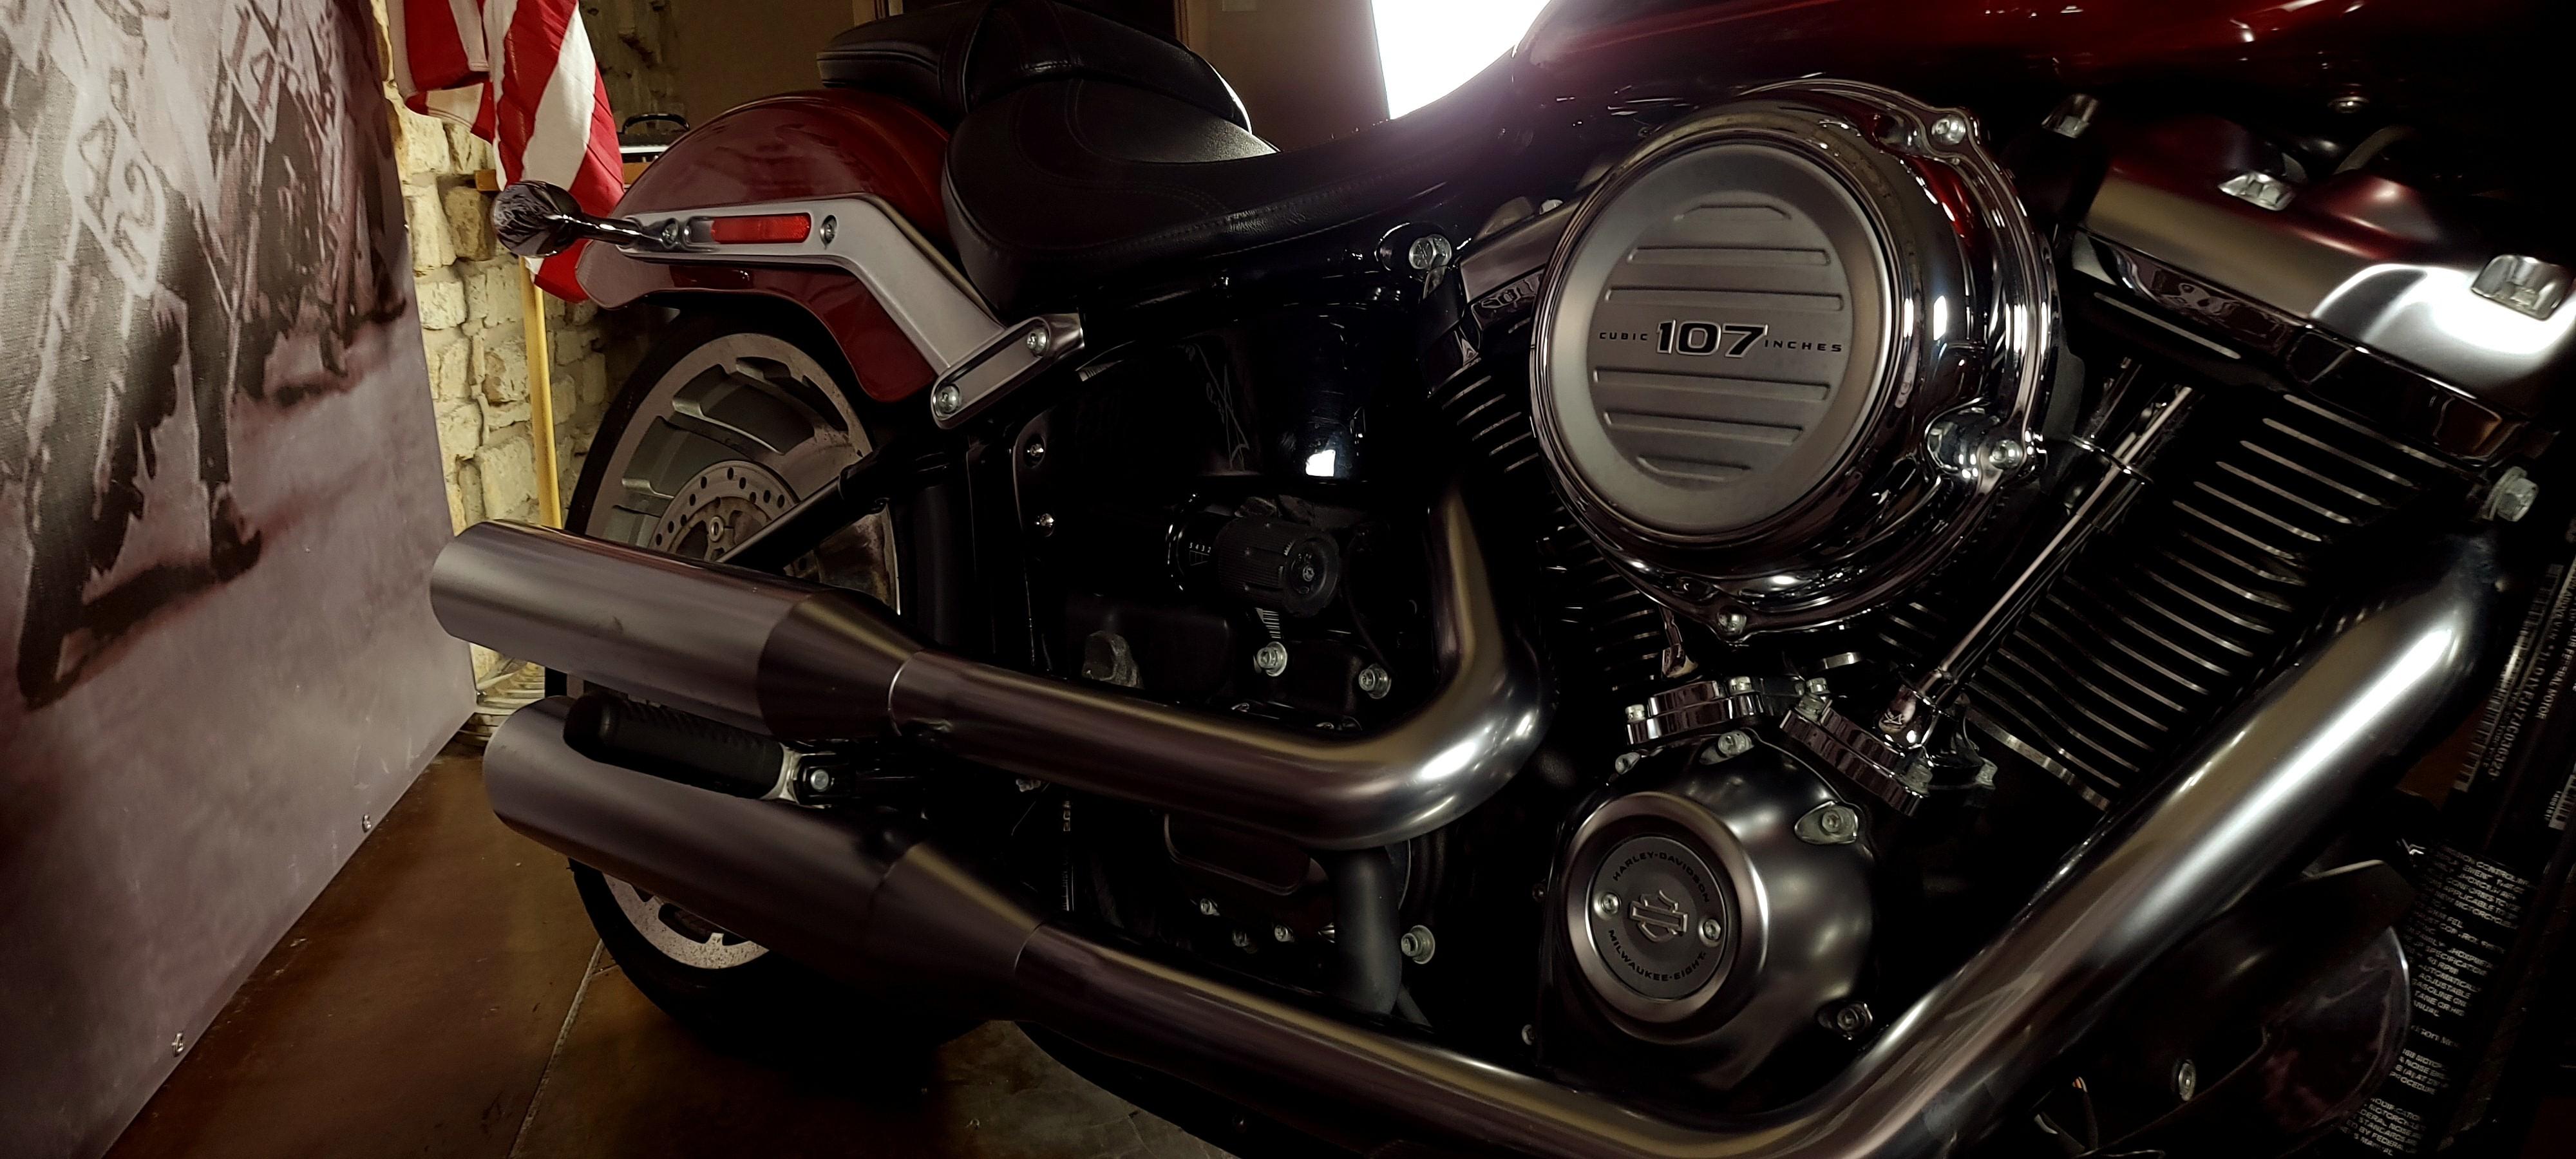 2018 Harley-Davidson Softail Fat Boy at Harley-Davidson of Waco